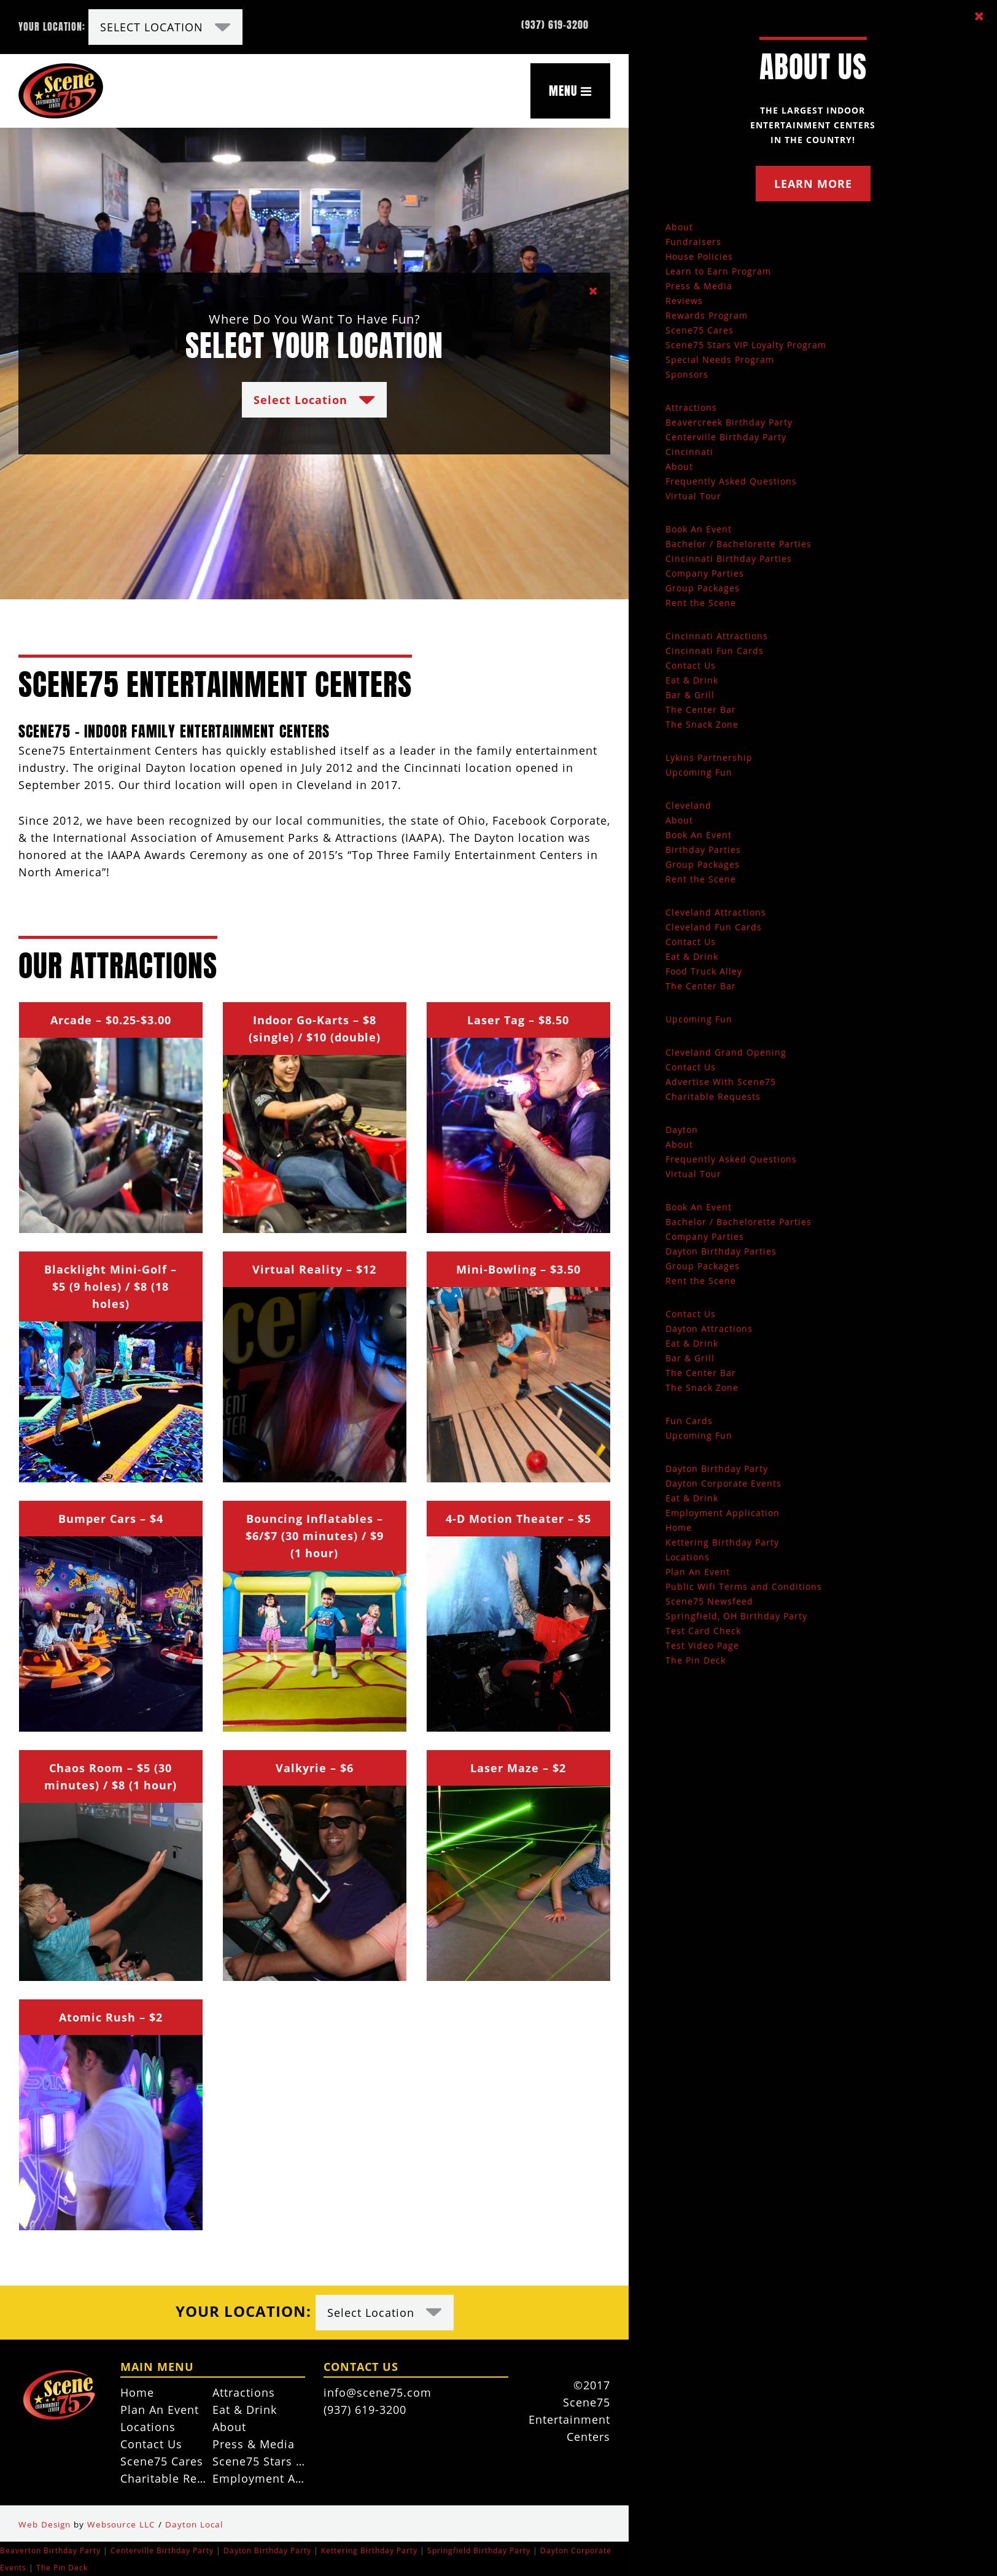 Amazing Scene75 Entertainment Centers Website History